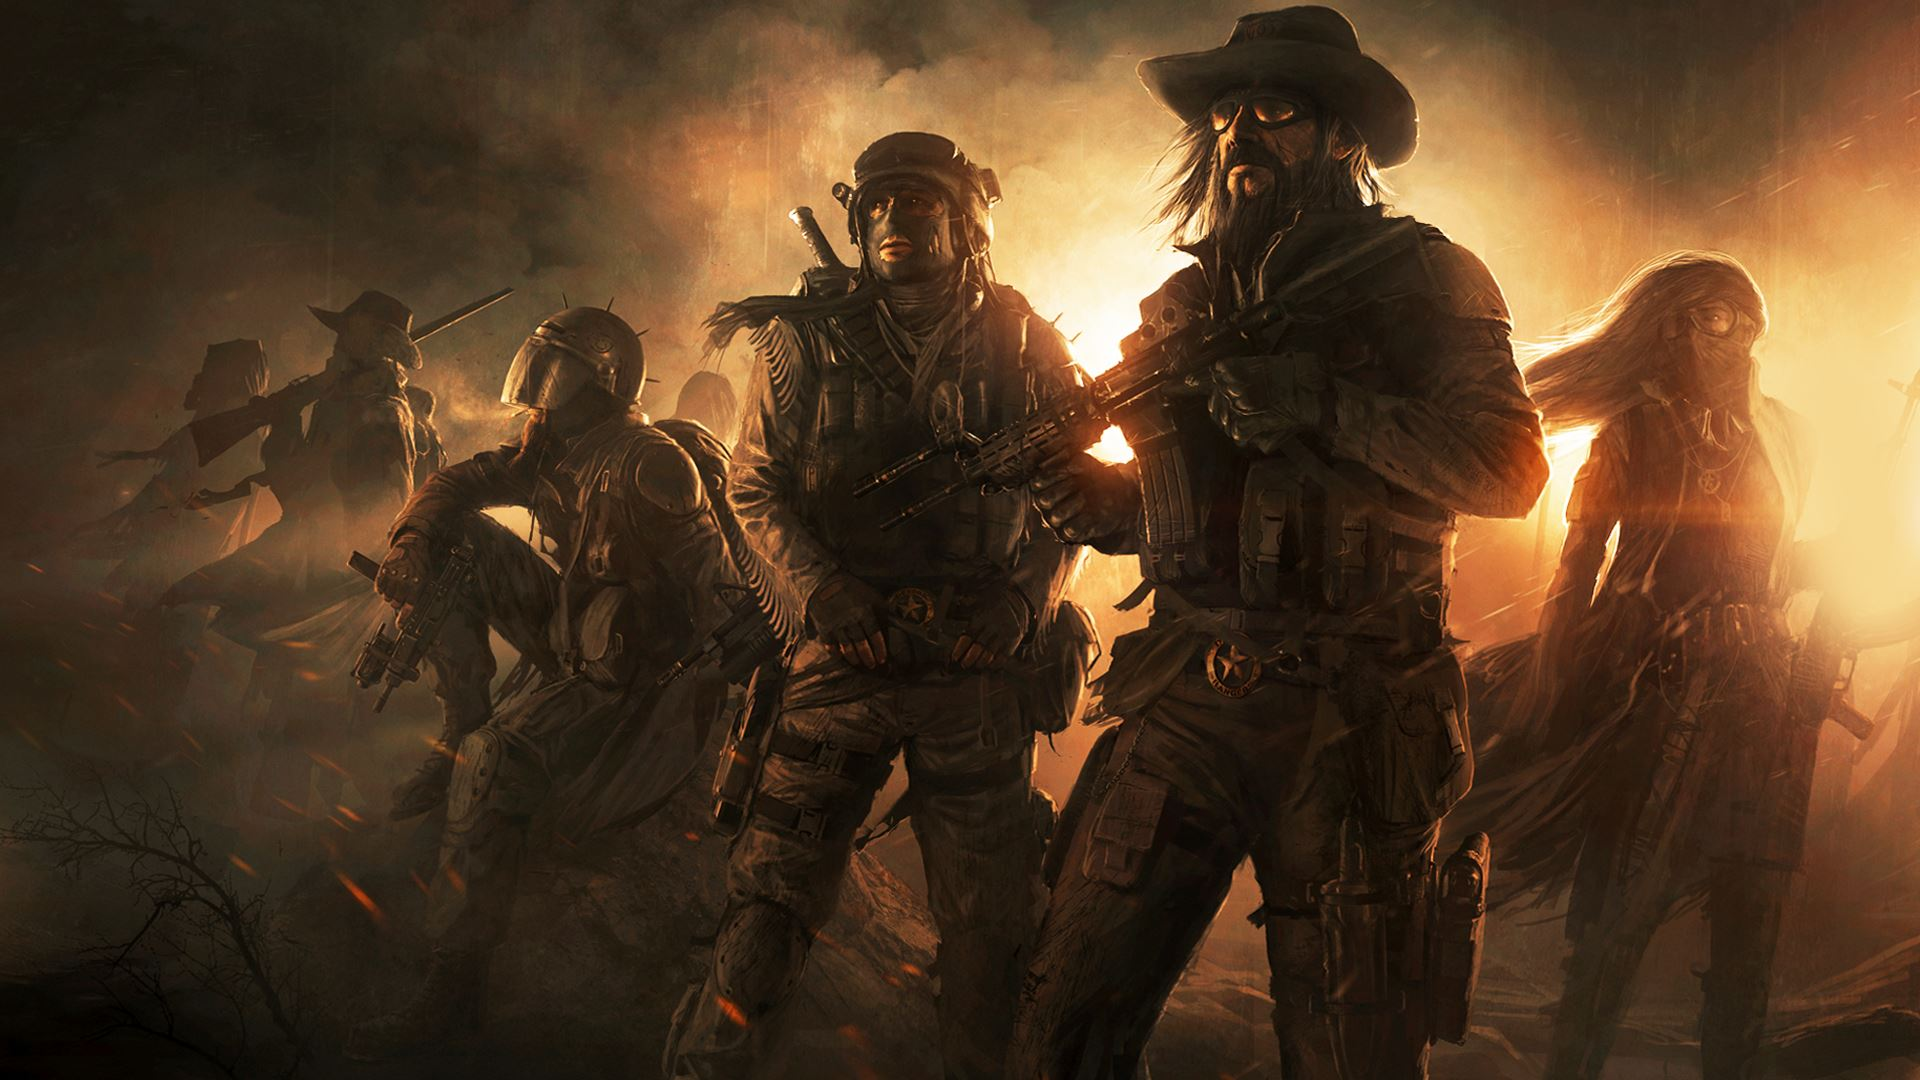 В Wasteland 2: Director's Cut добавлена поддержка модов